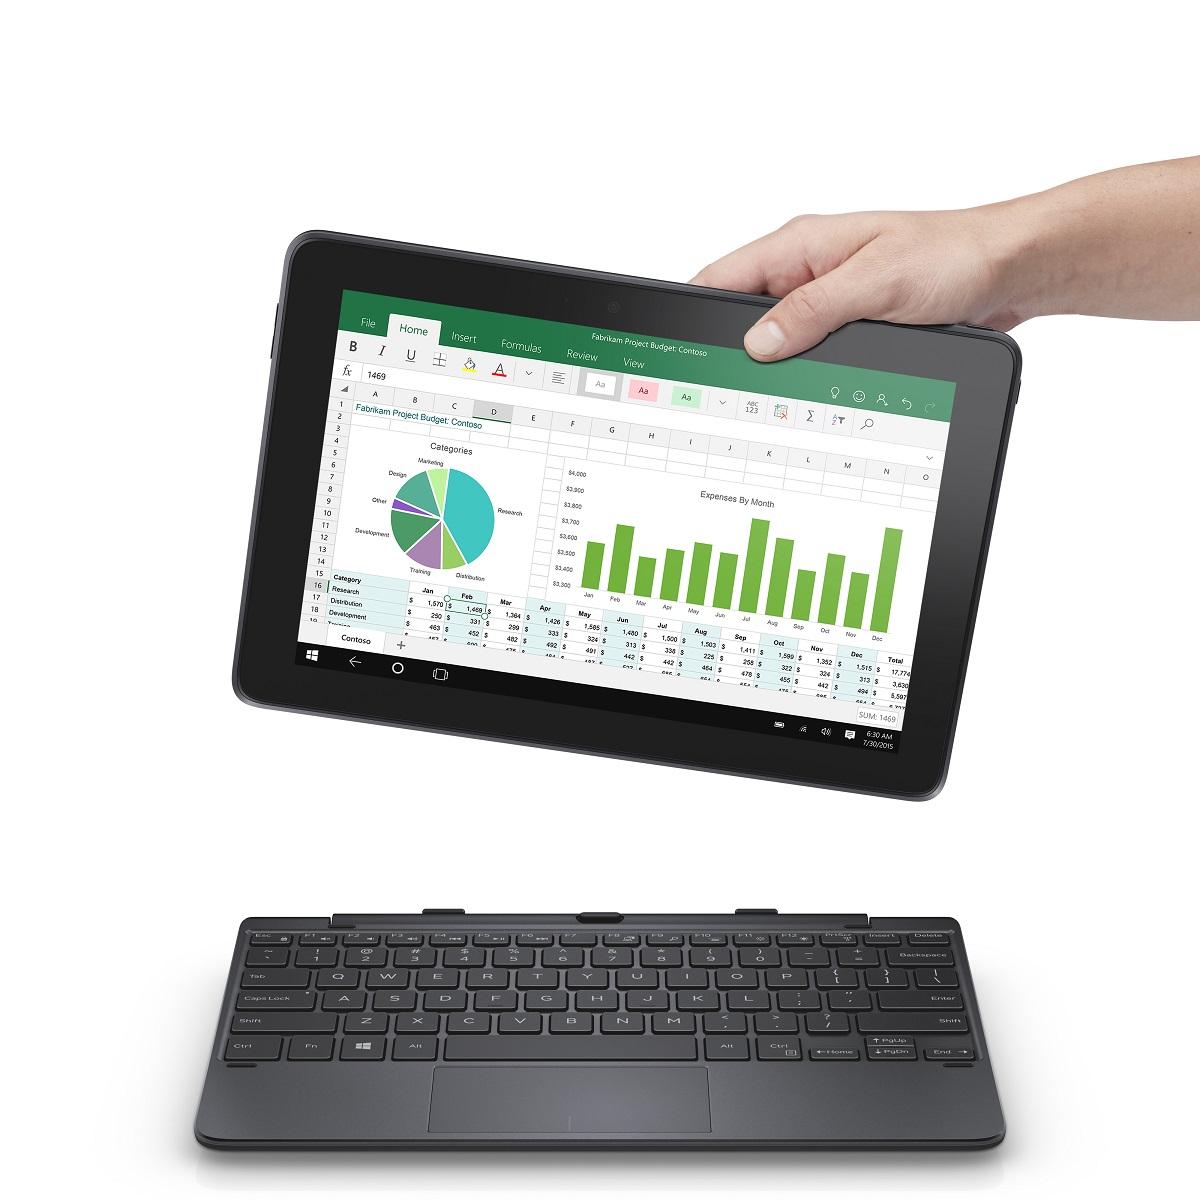 Dell Venue 8 Pro med Windows 10.